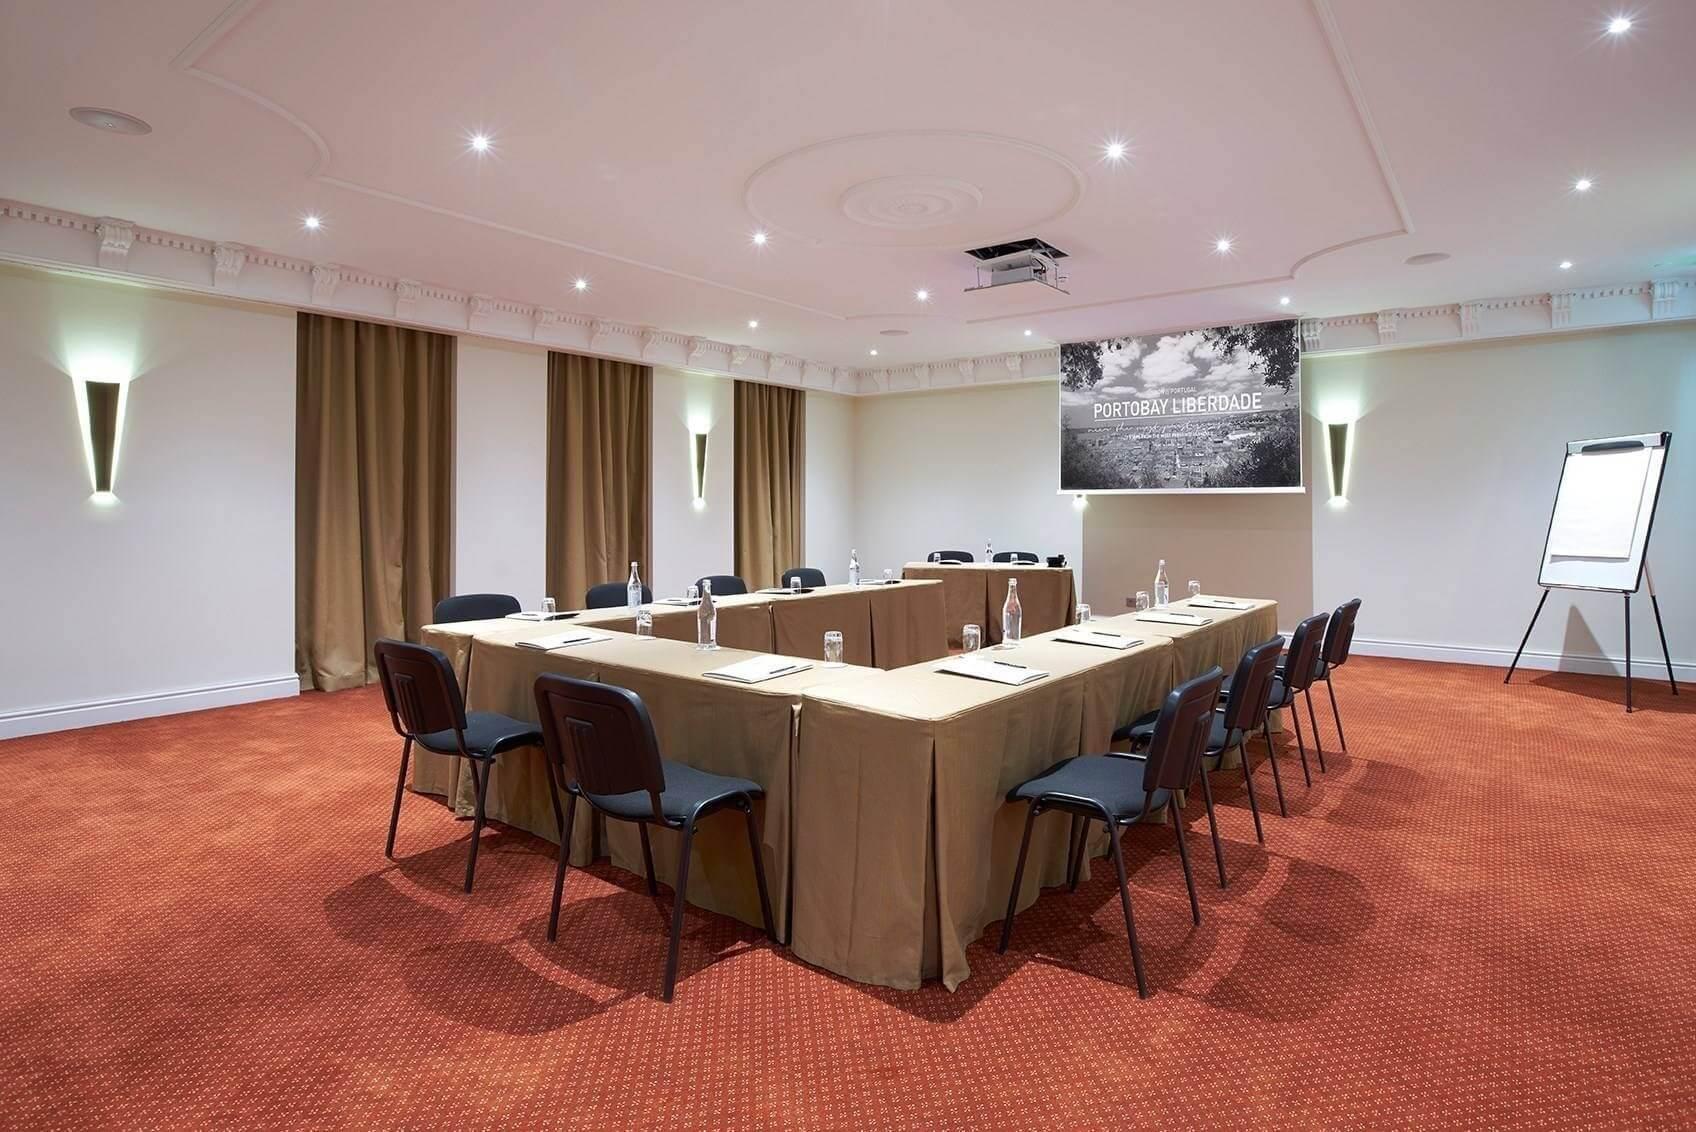 PortoBay Liberdade - Meeting Rooms